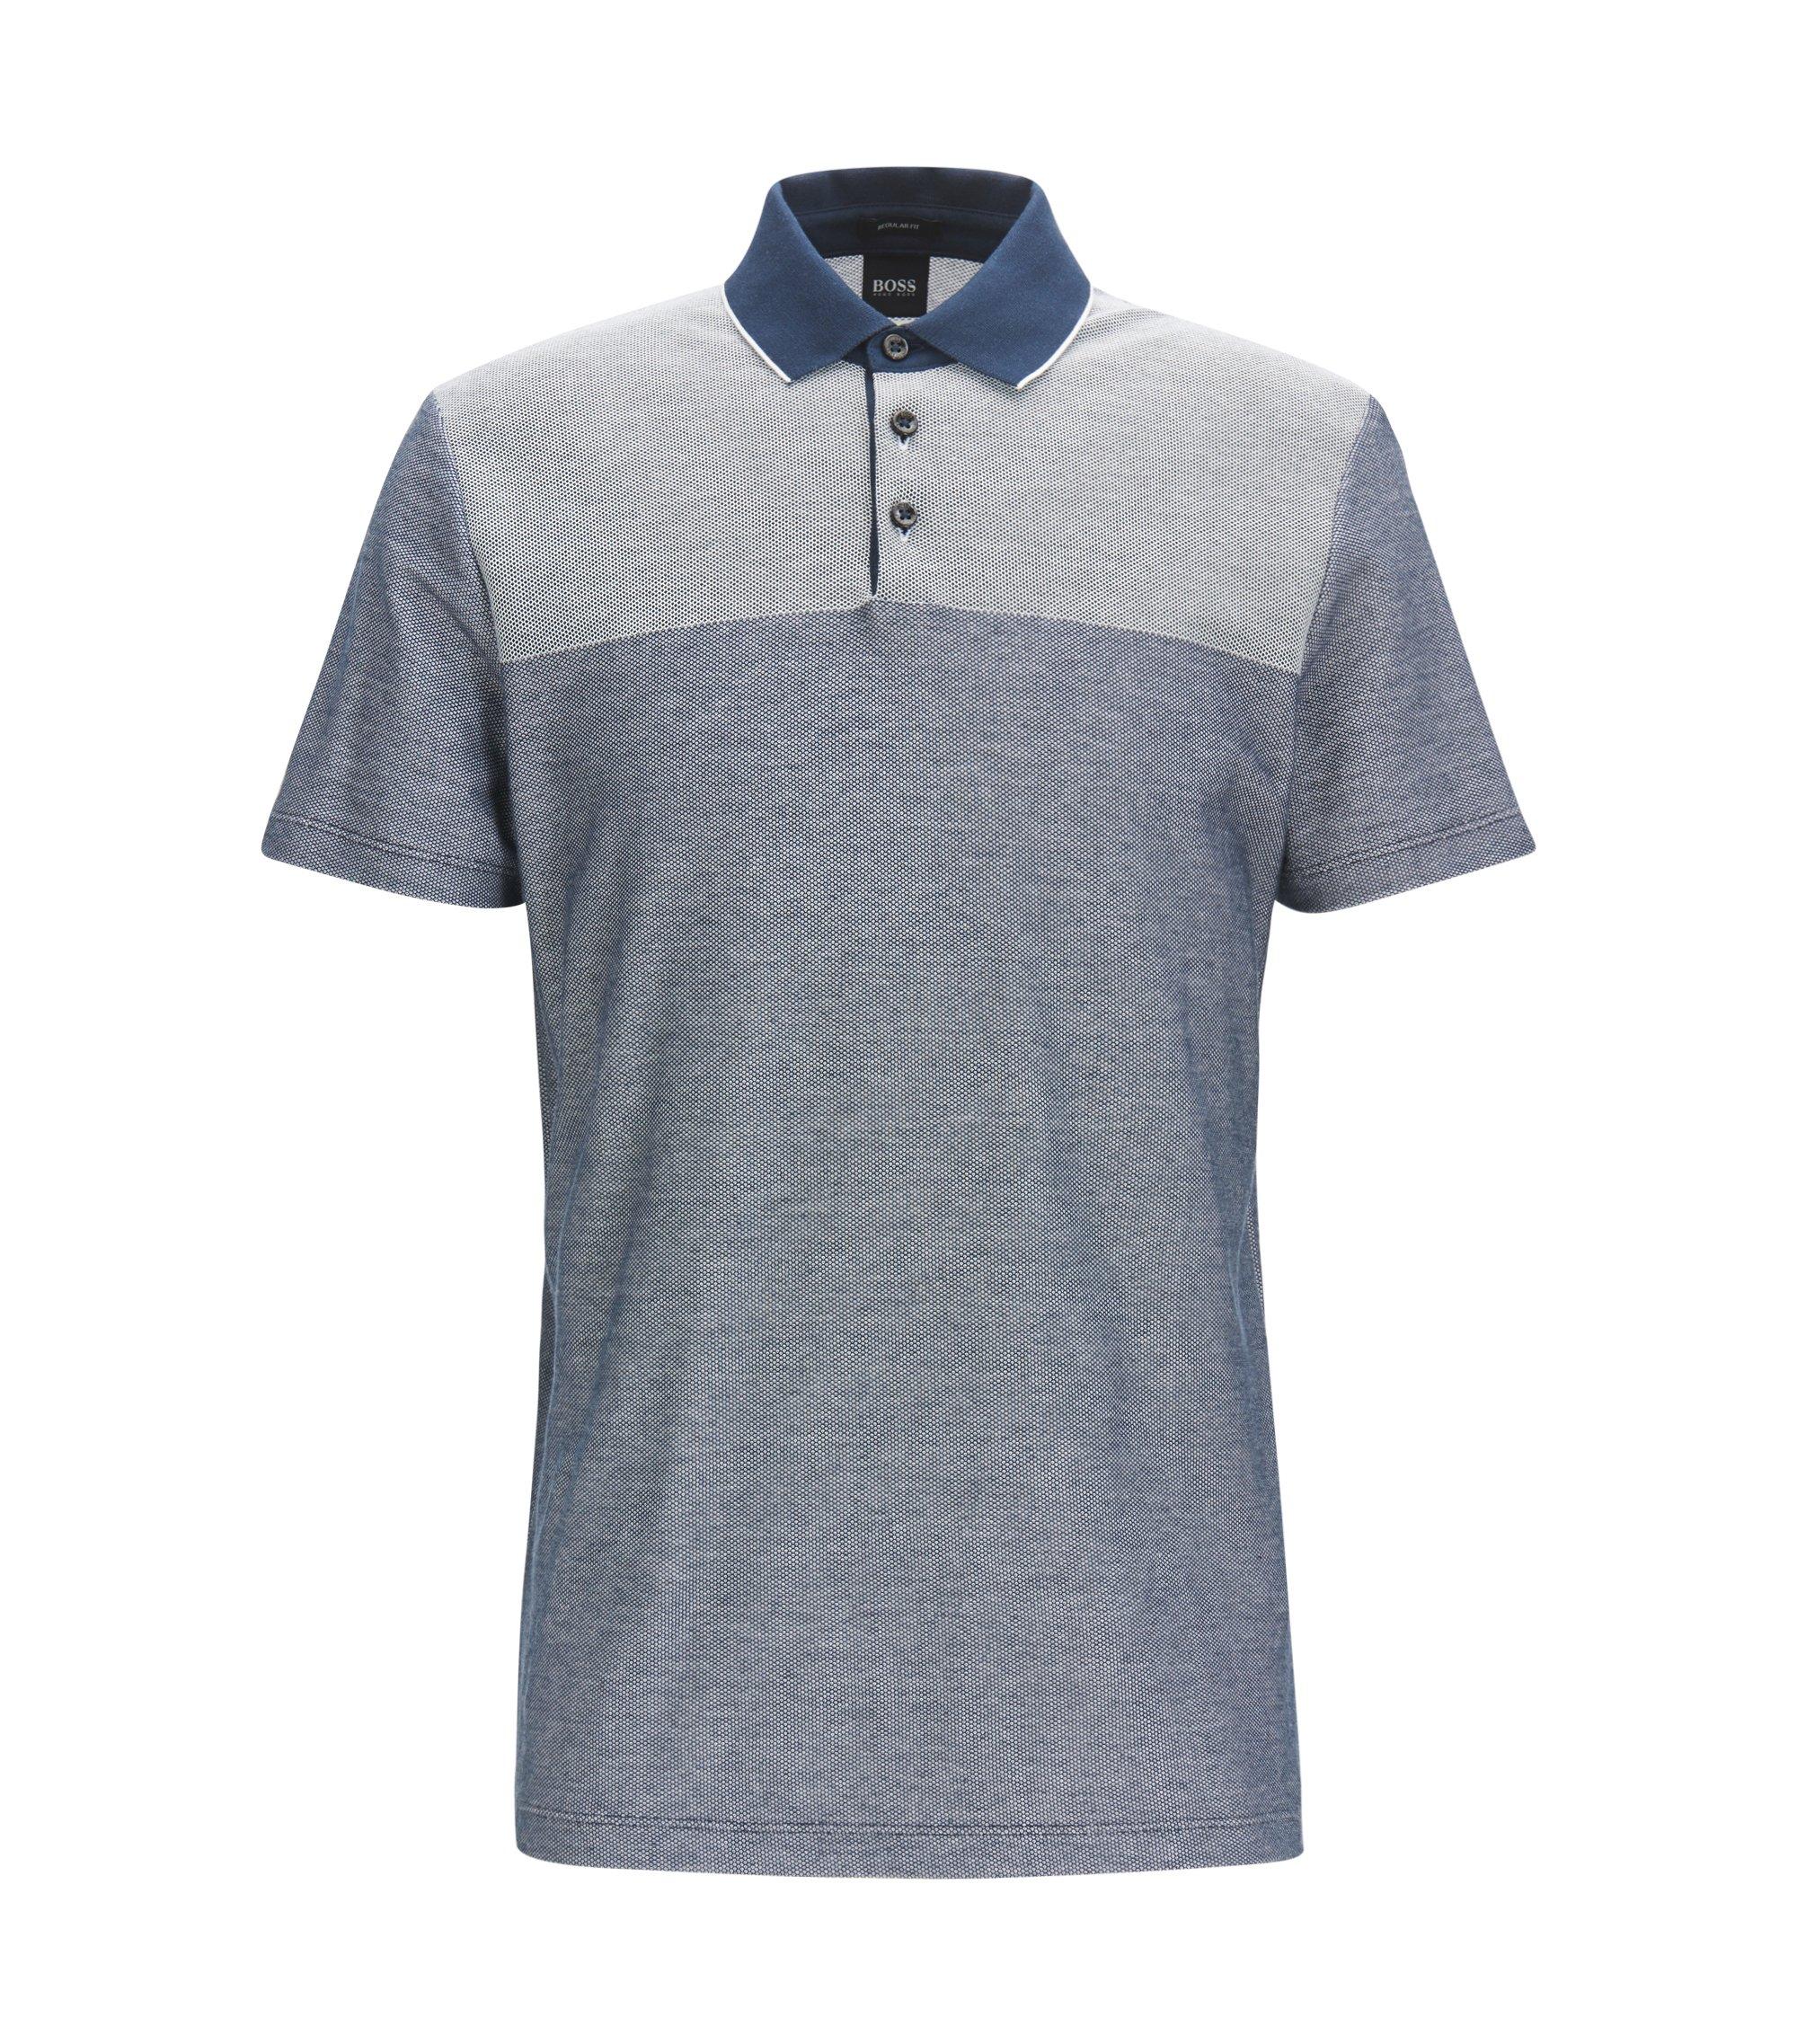 Mercerized Cotton Knit Polo Shirt, Regular Fit | Pack, Dark Blue